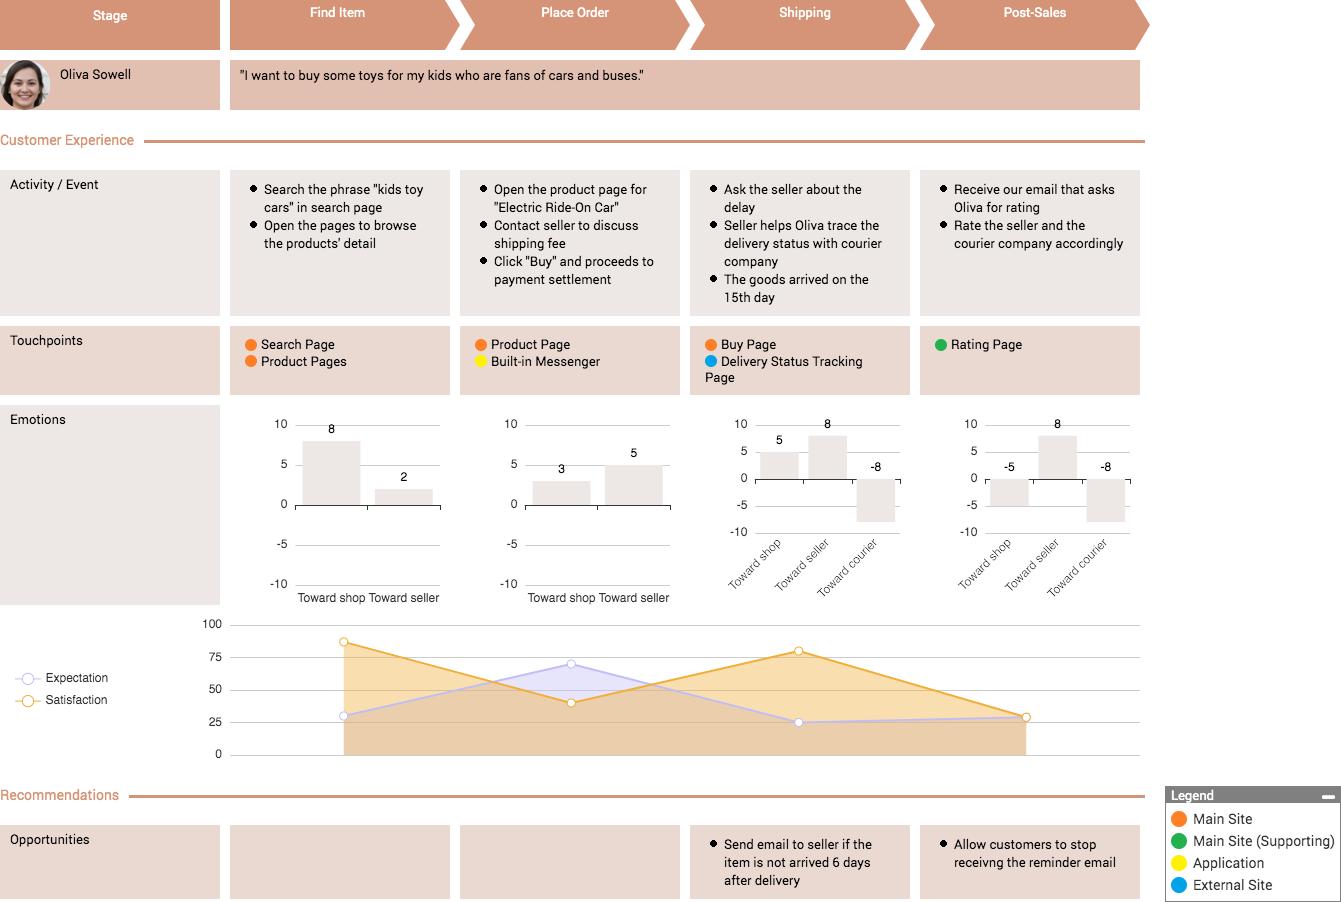 Customer Journey Map (CJM) template